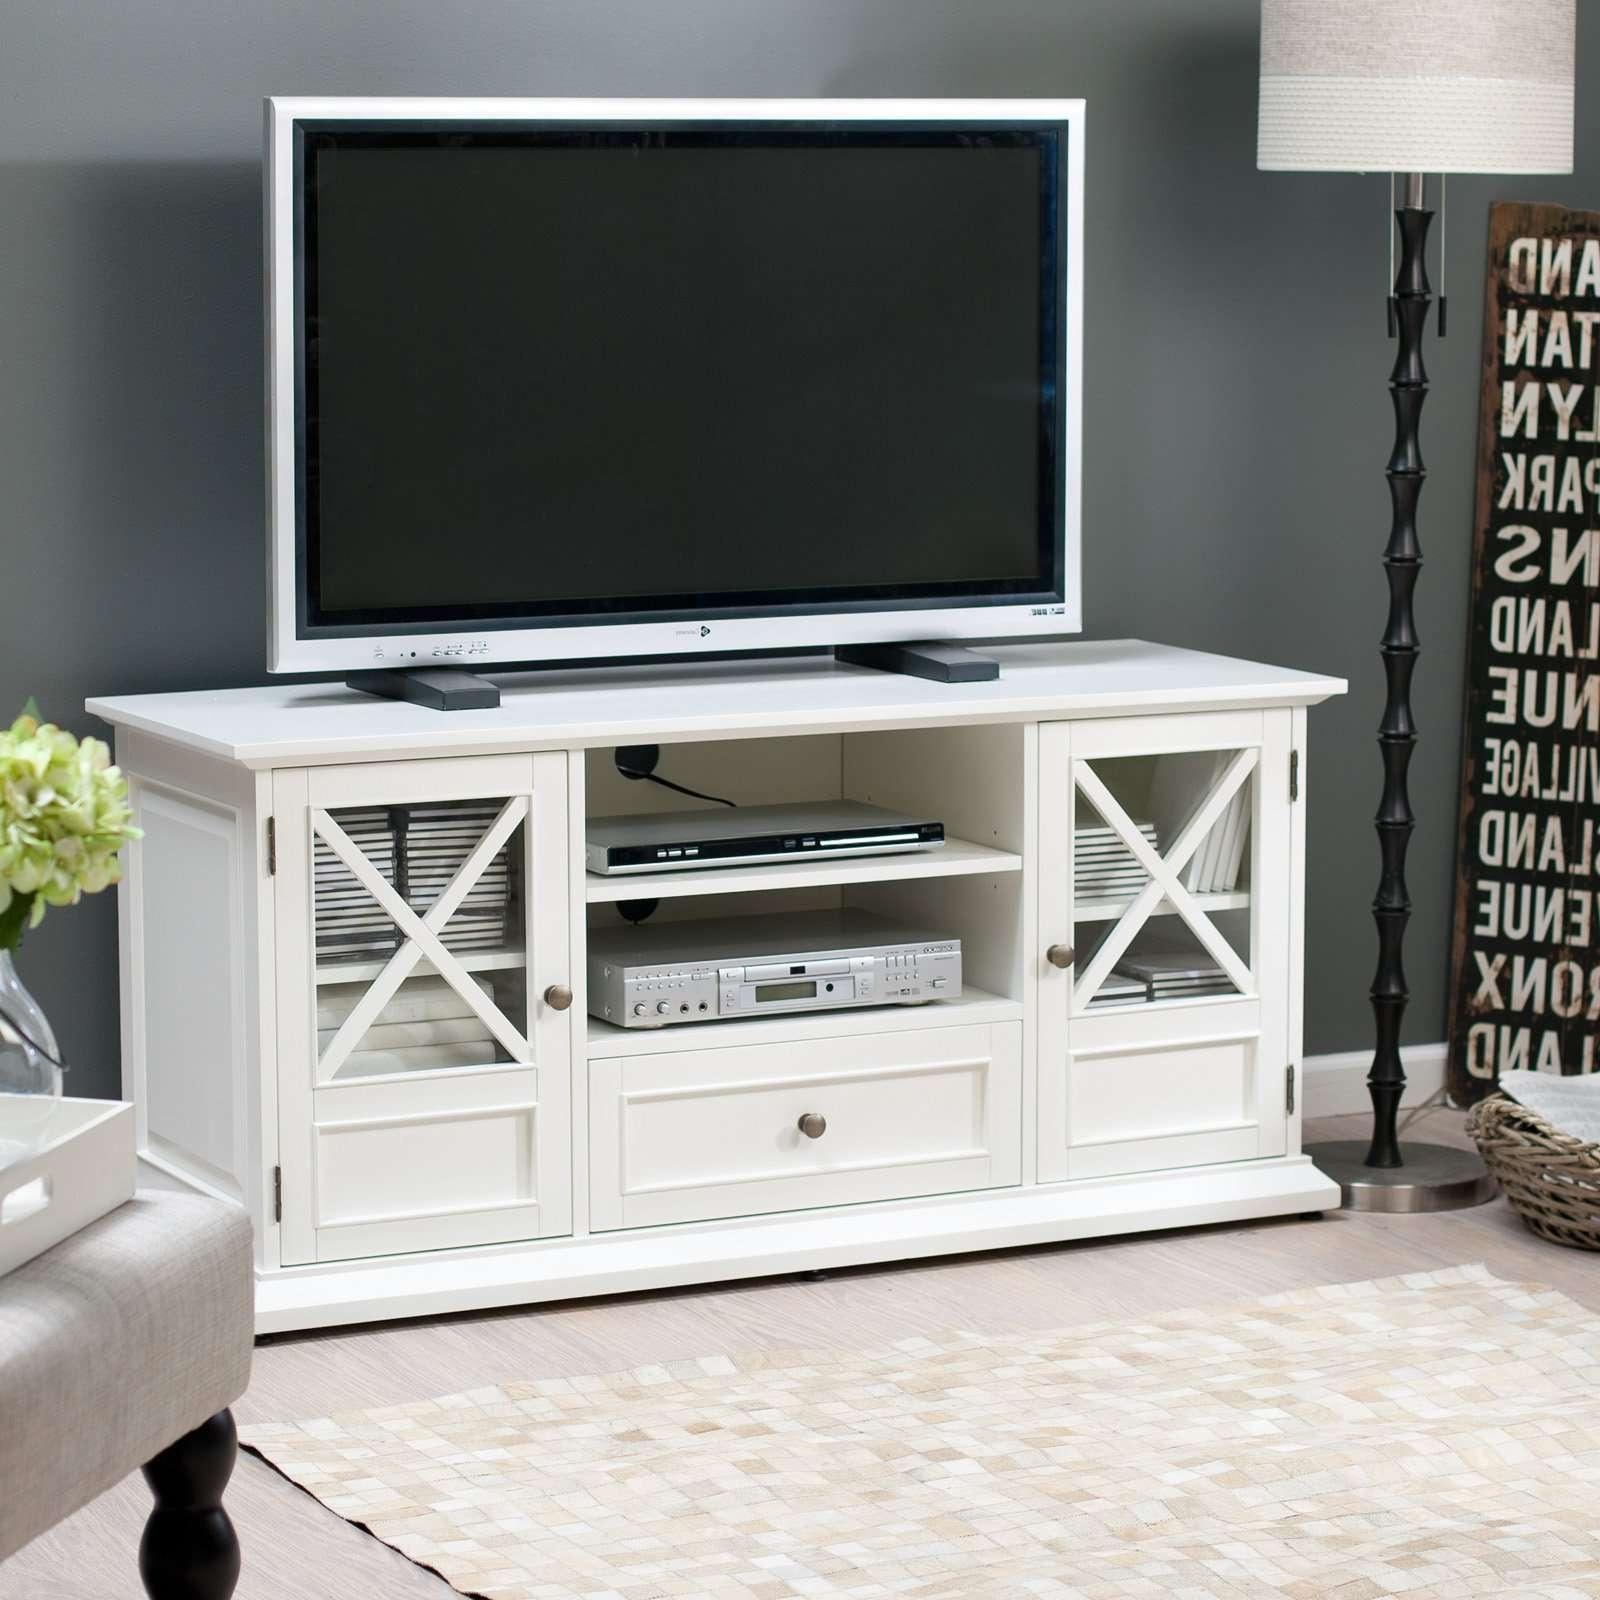 Belham Living Hampton Tv Stand – White – Walmart For Tv Stands White (View 4 of 20)